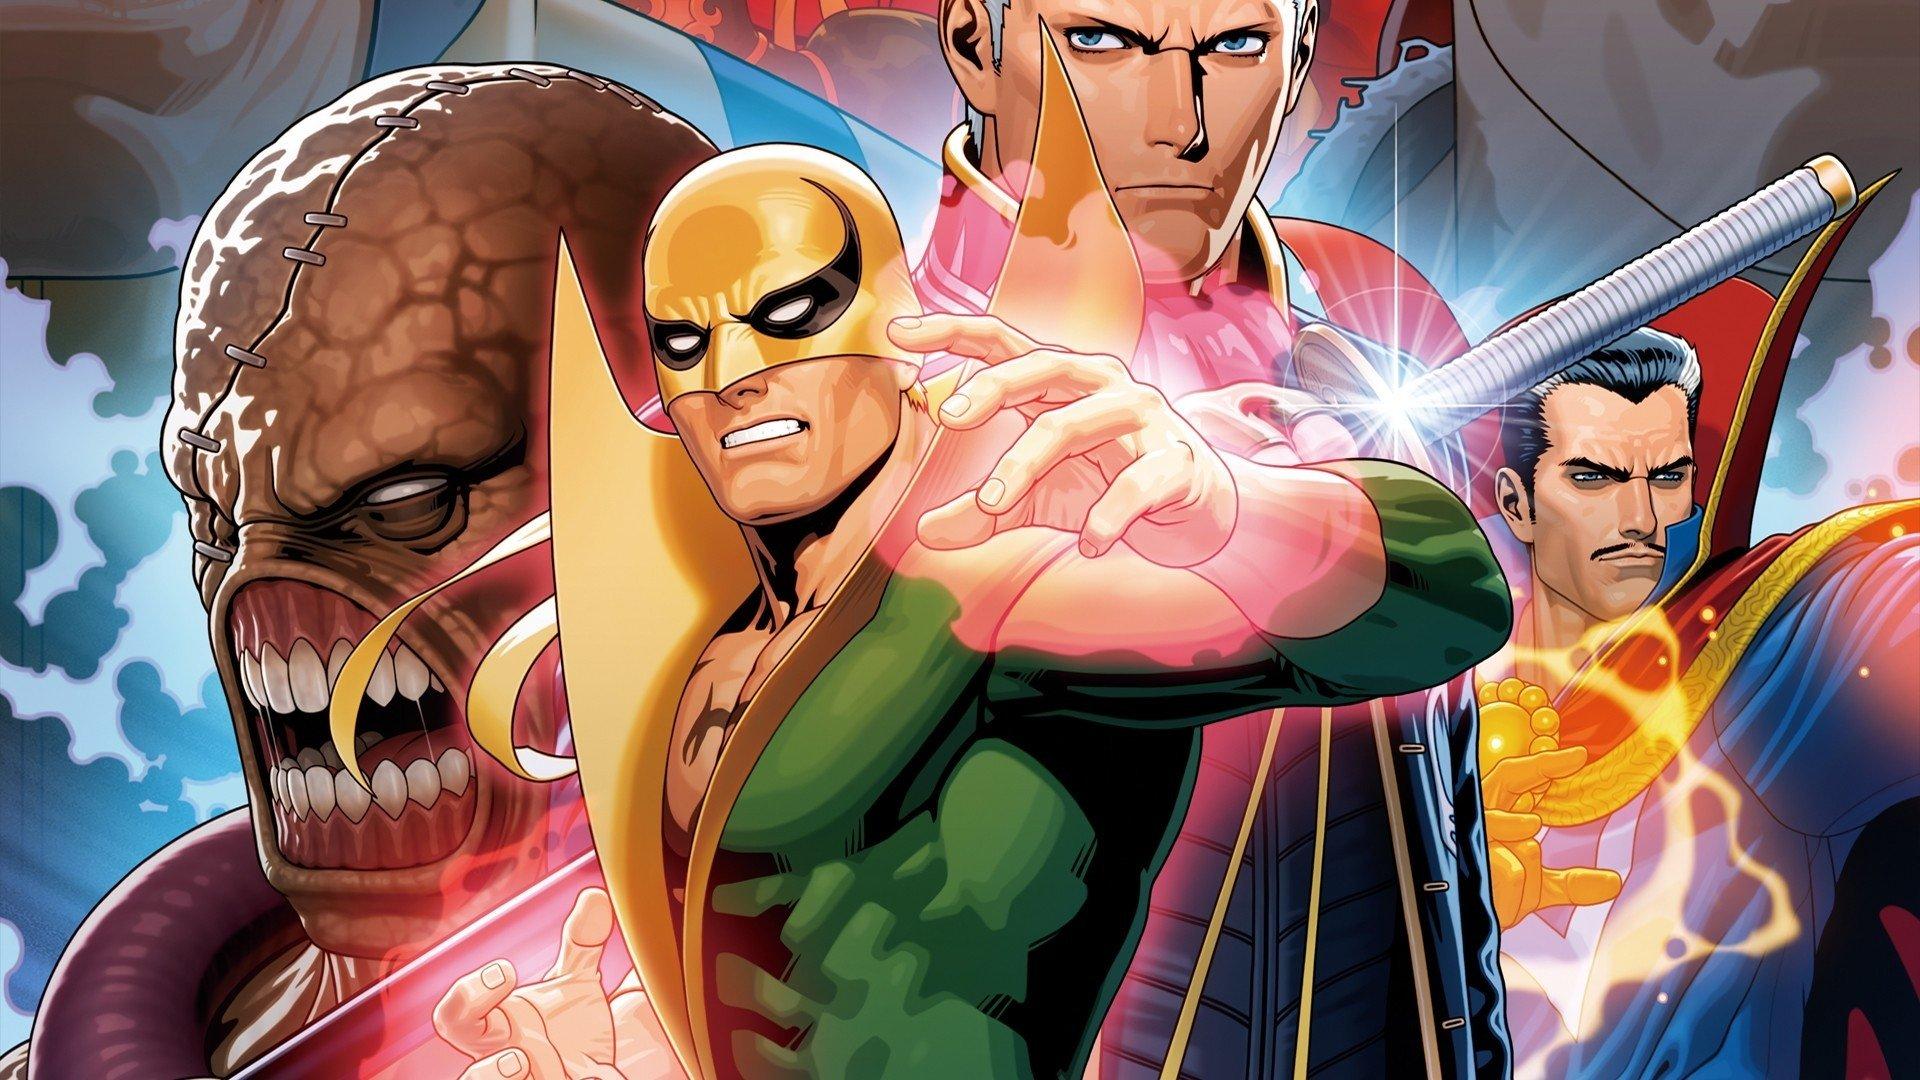 Ultimate Marvel Vs Capcom 3 Hd Wallpaper Background Image